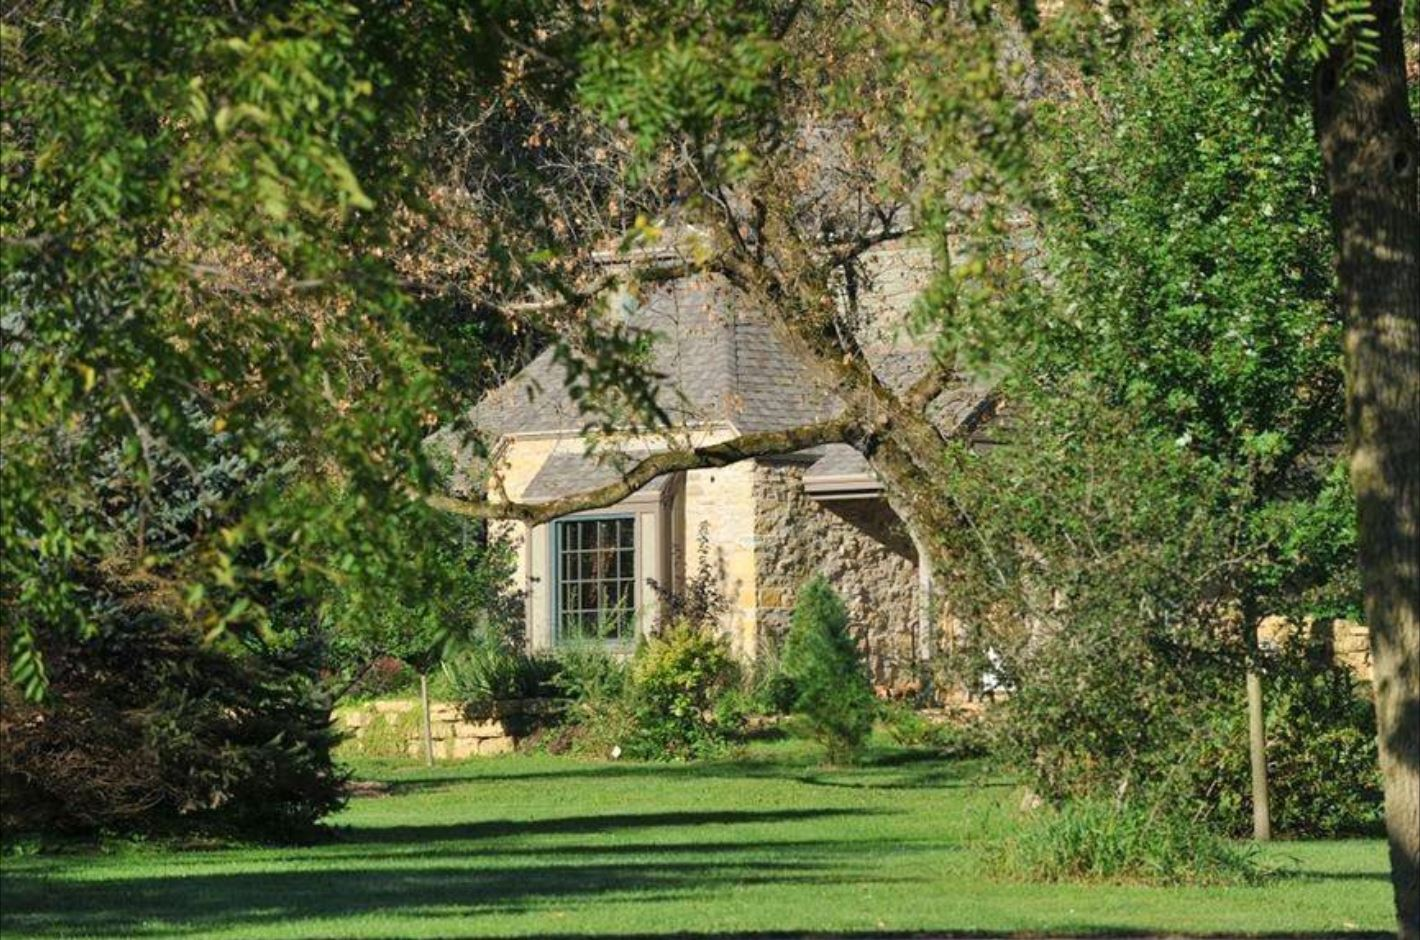 Inn At Irish Hollow In Galena, Illinois Has The Best ...